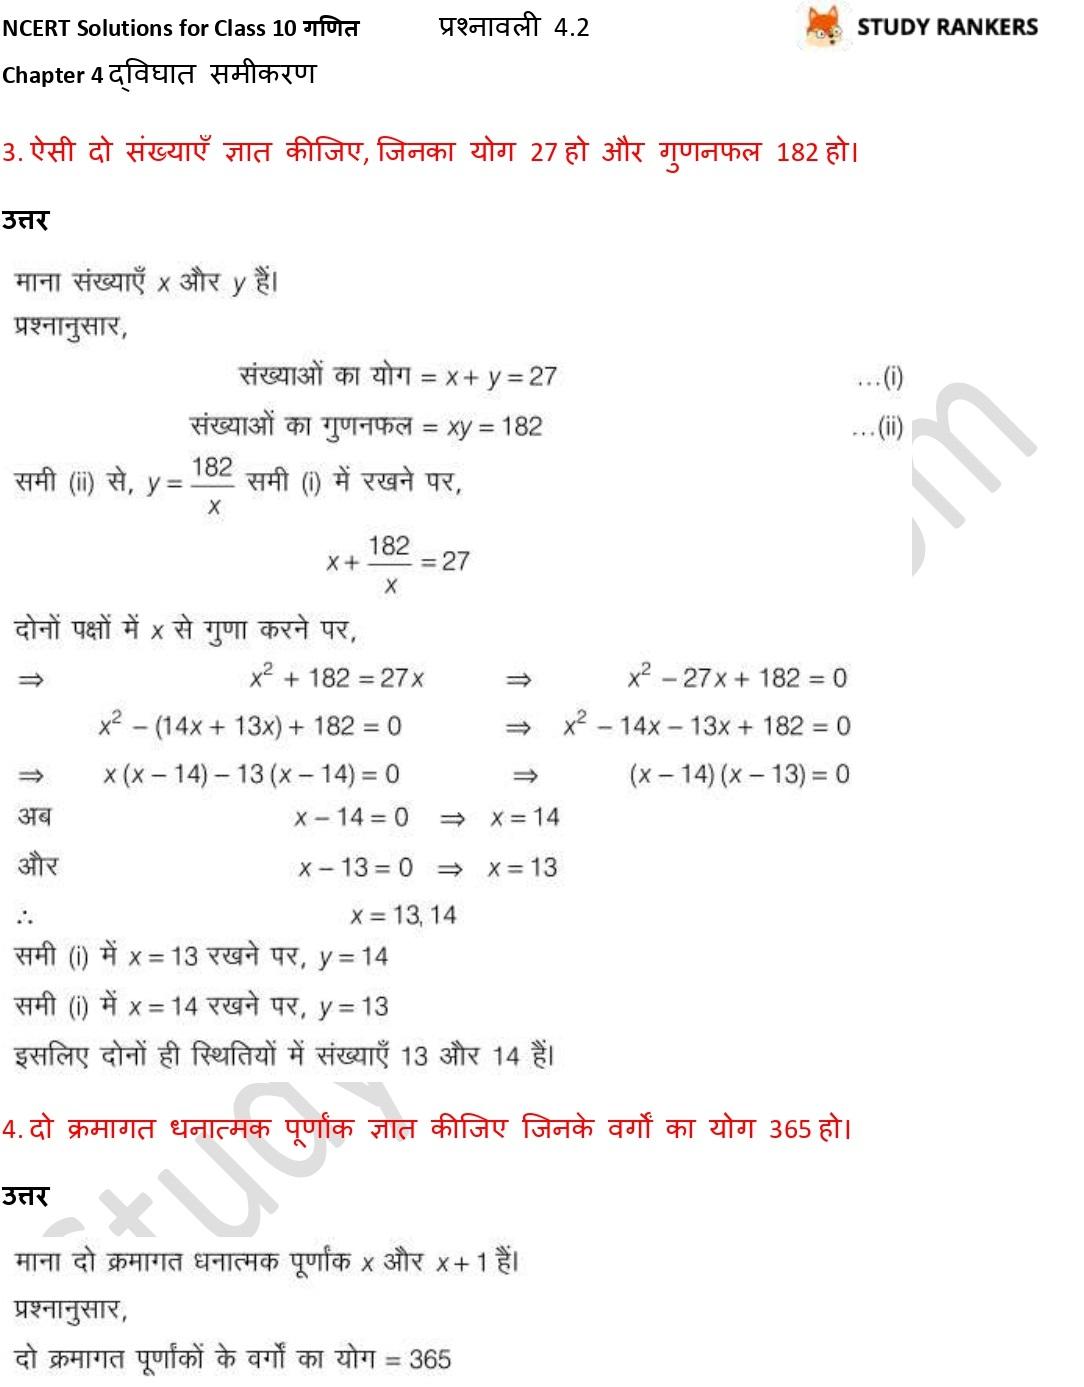 NCERT Solutions for Class 10 Maths Chapter 4 द्विघात समीकरण प्रश्नावली 4.2 Part 5